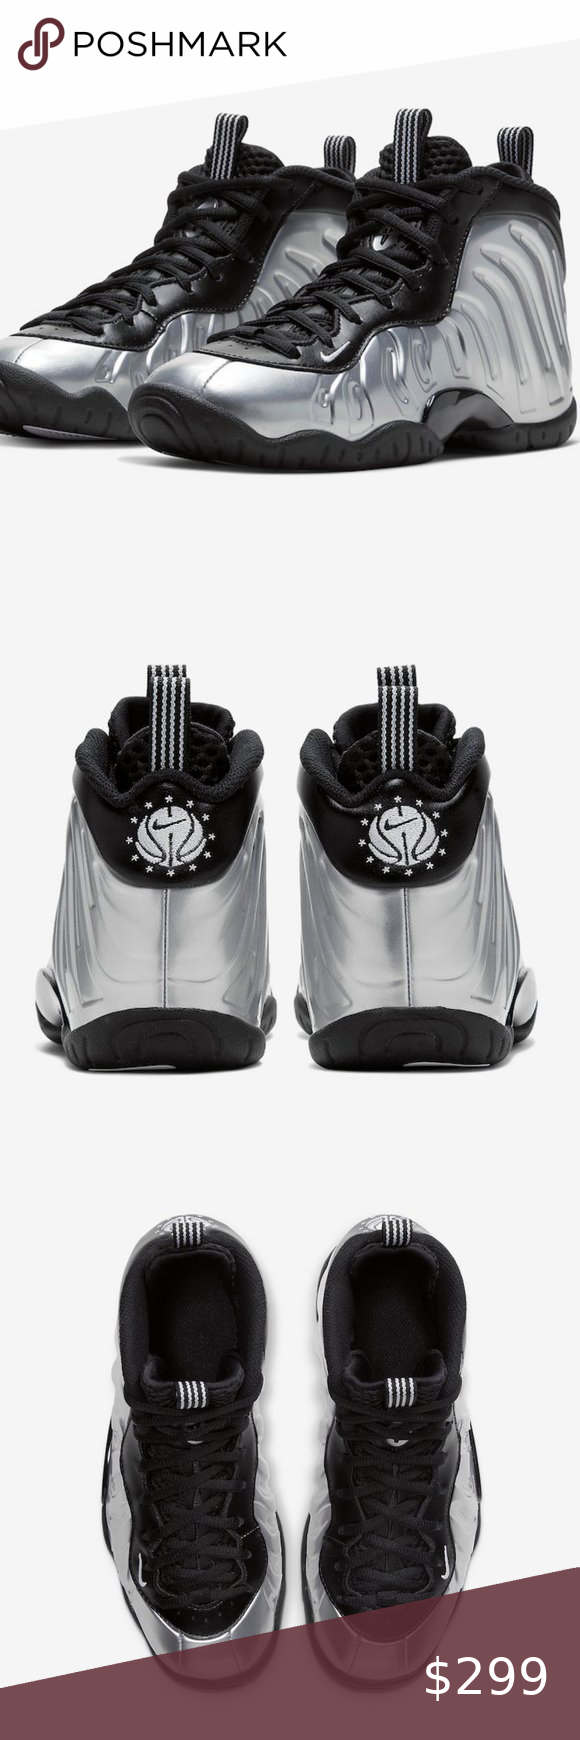 Nike Air Foamposite One Shattered Backboard White Black ...